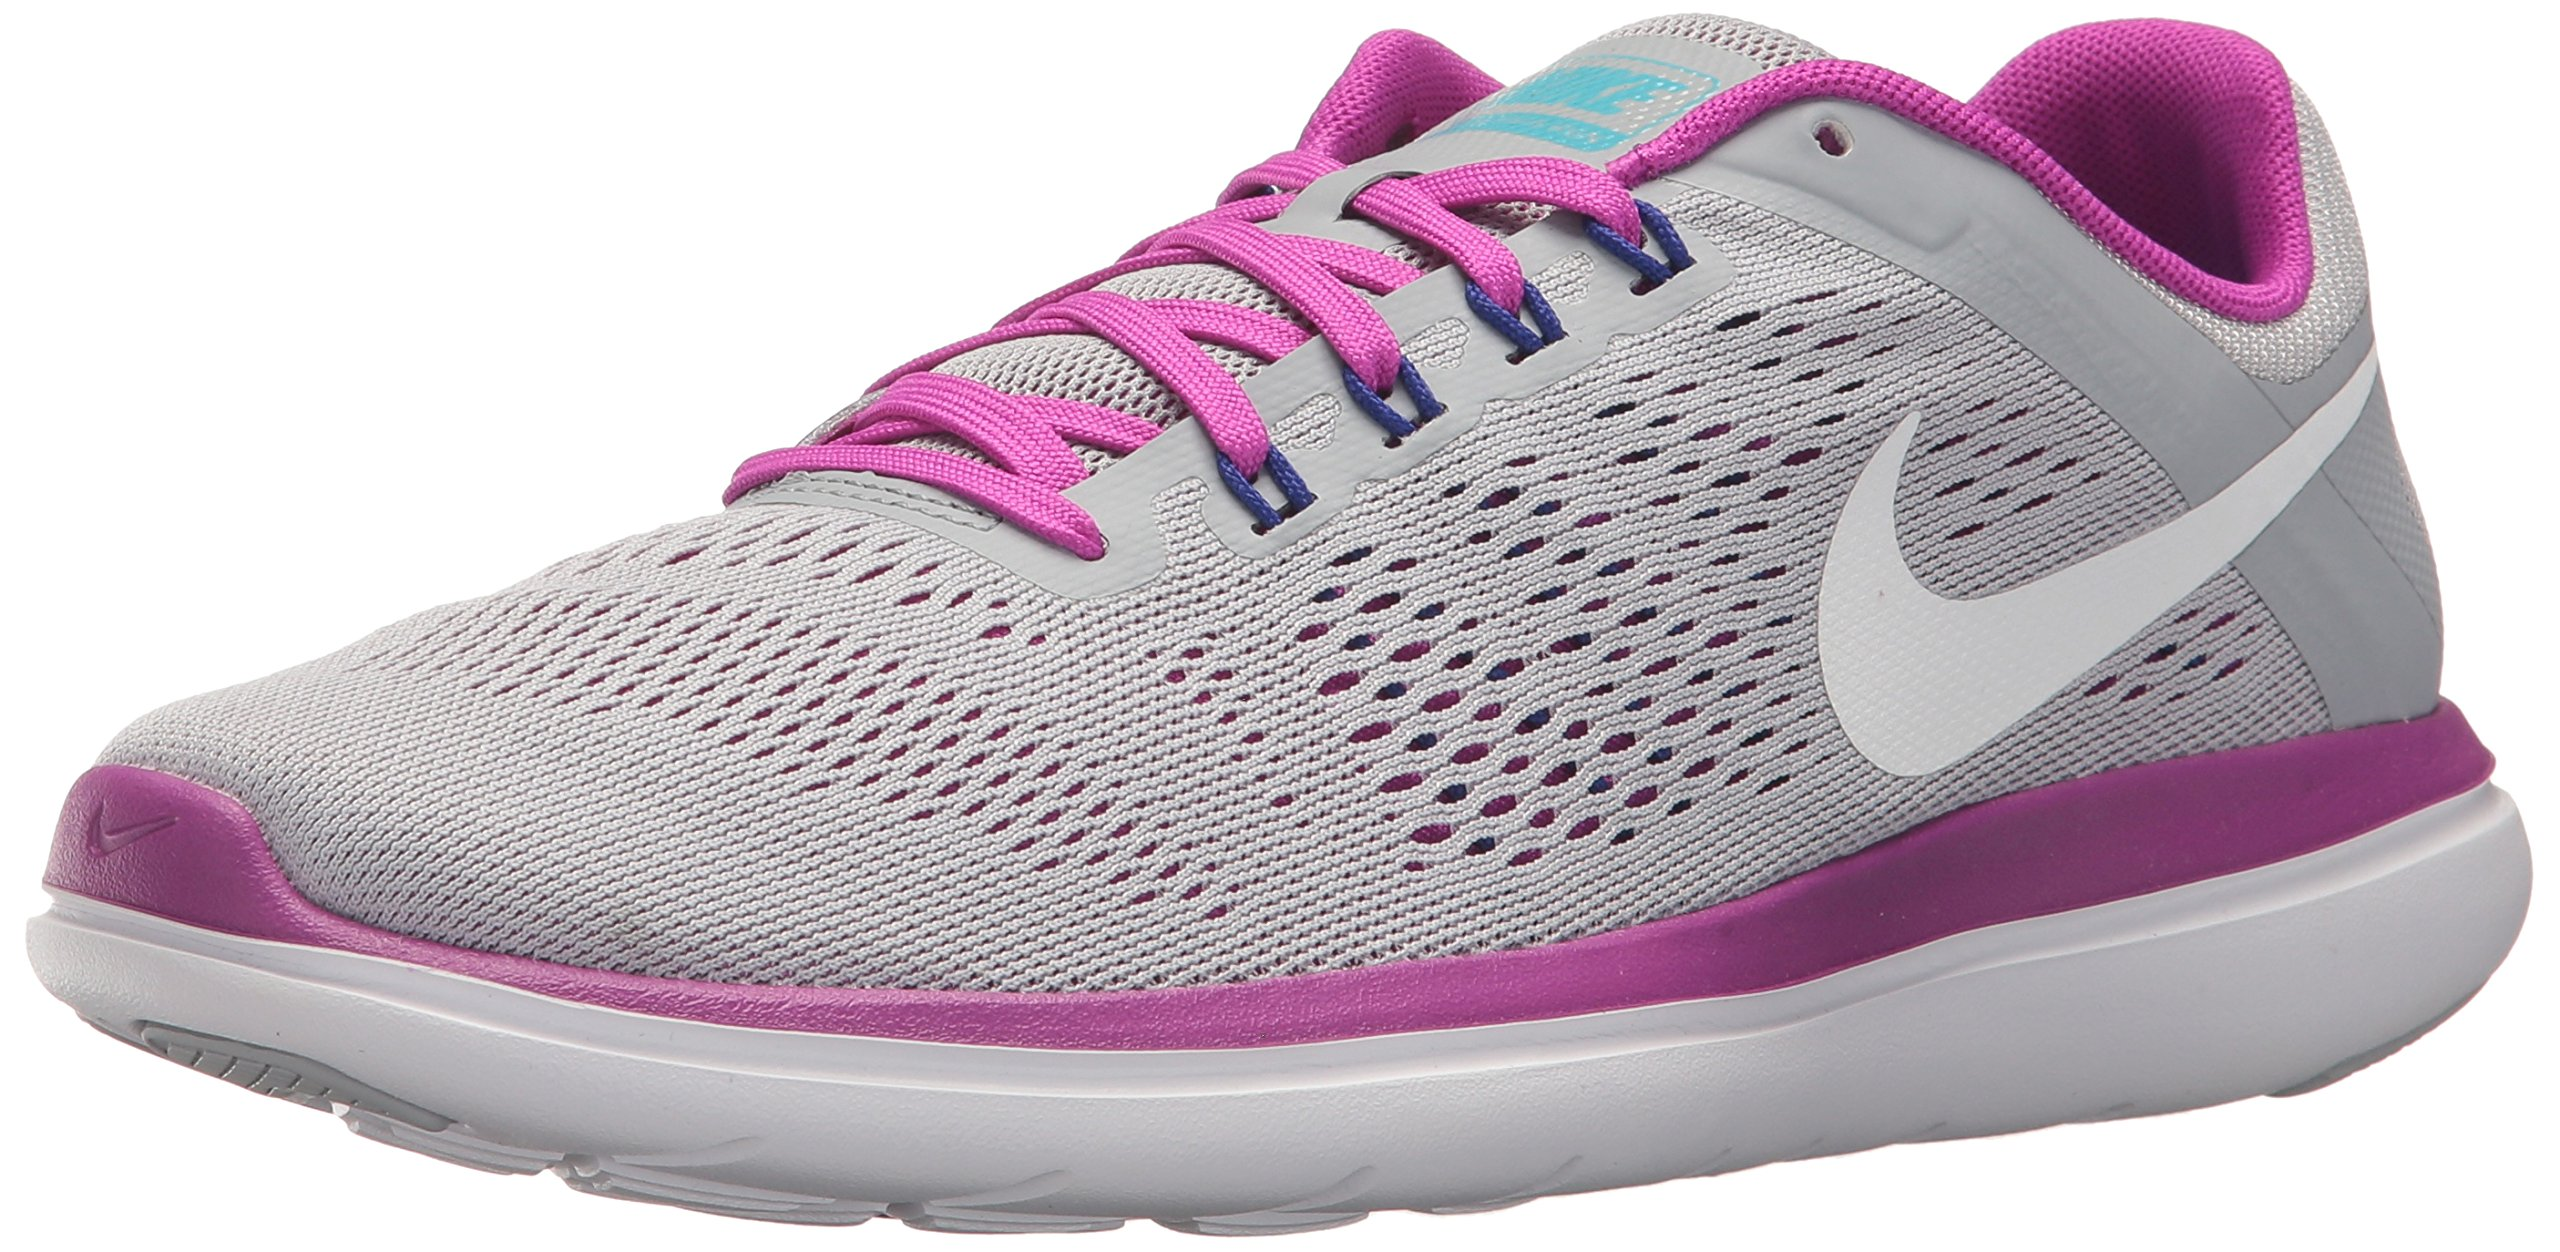 c3e589e6c44426 Galleon - NIKE Women s Flex 2016 RN Running Shoe